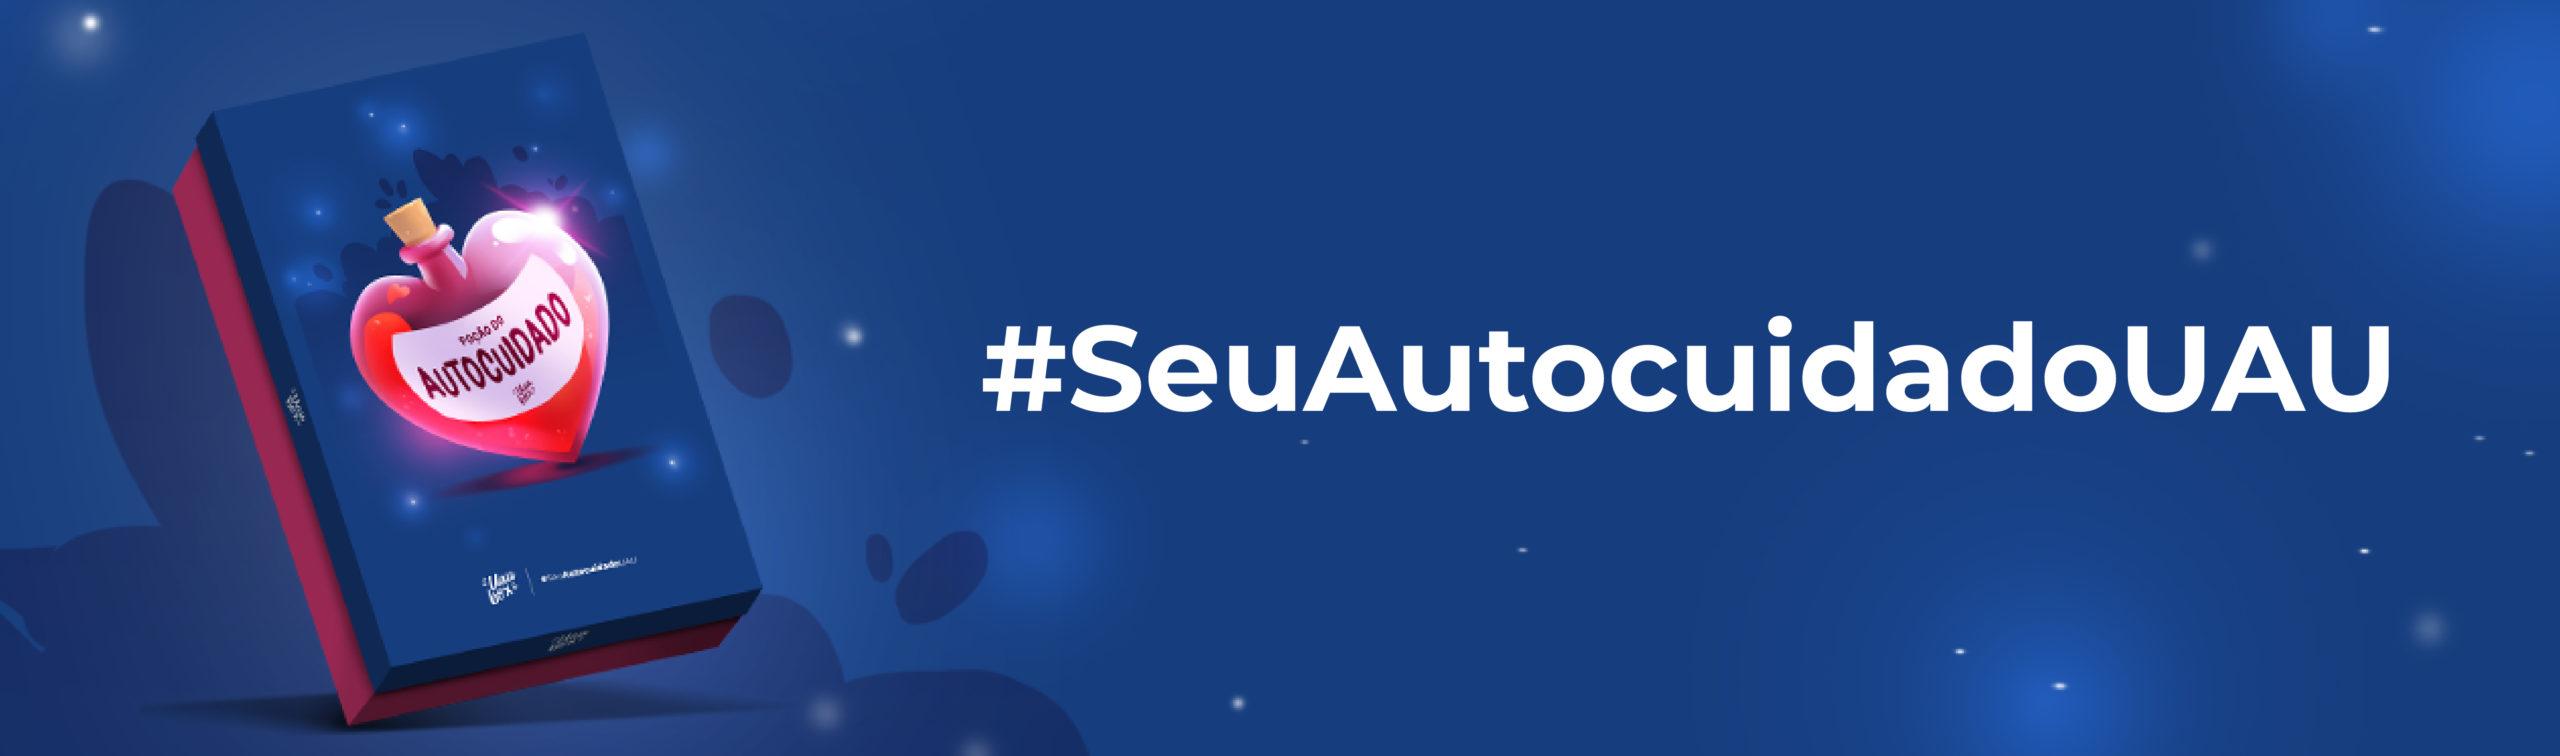 #seuautocuidadouau